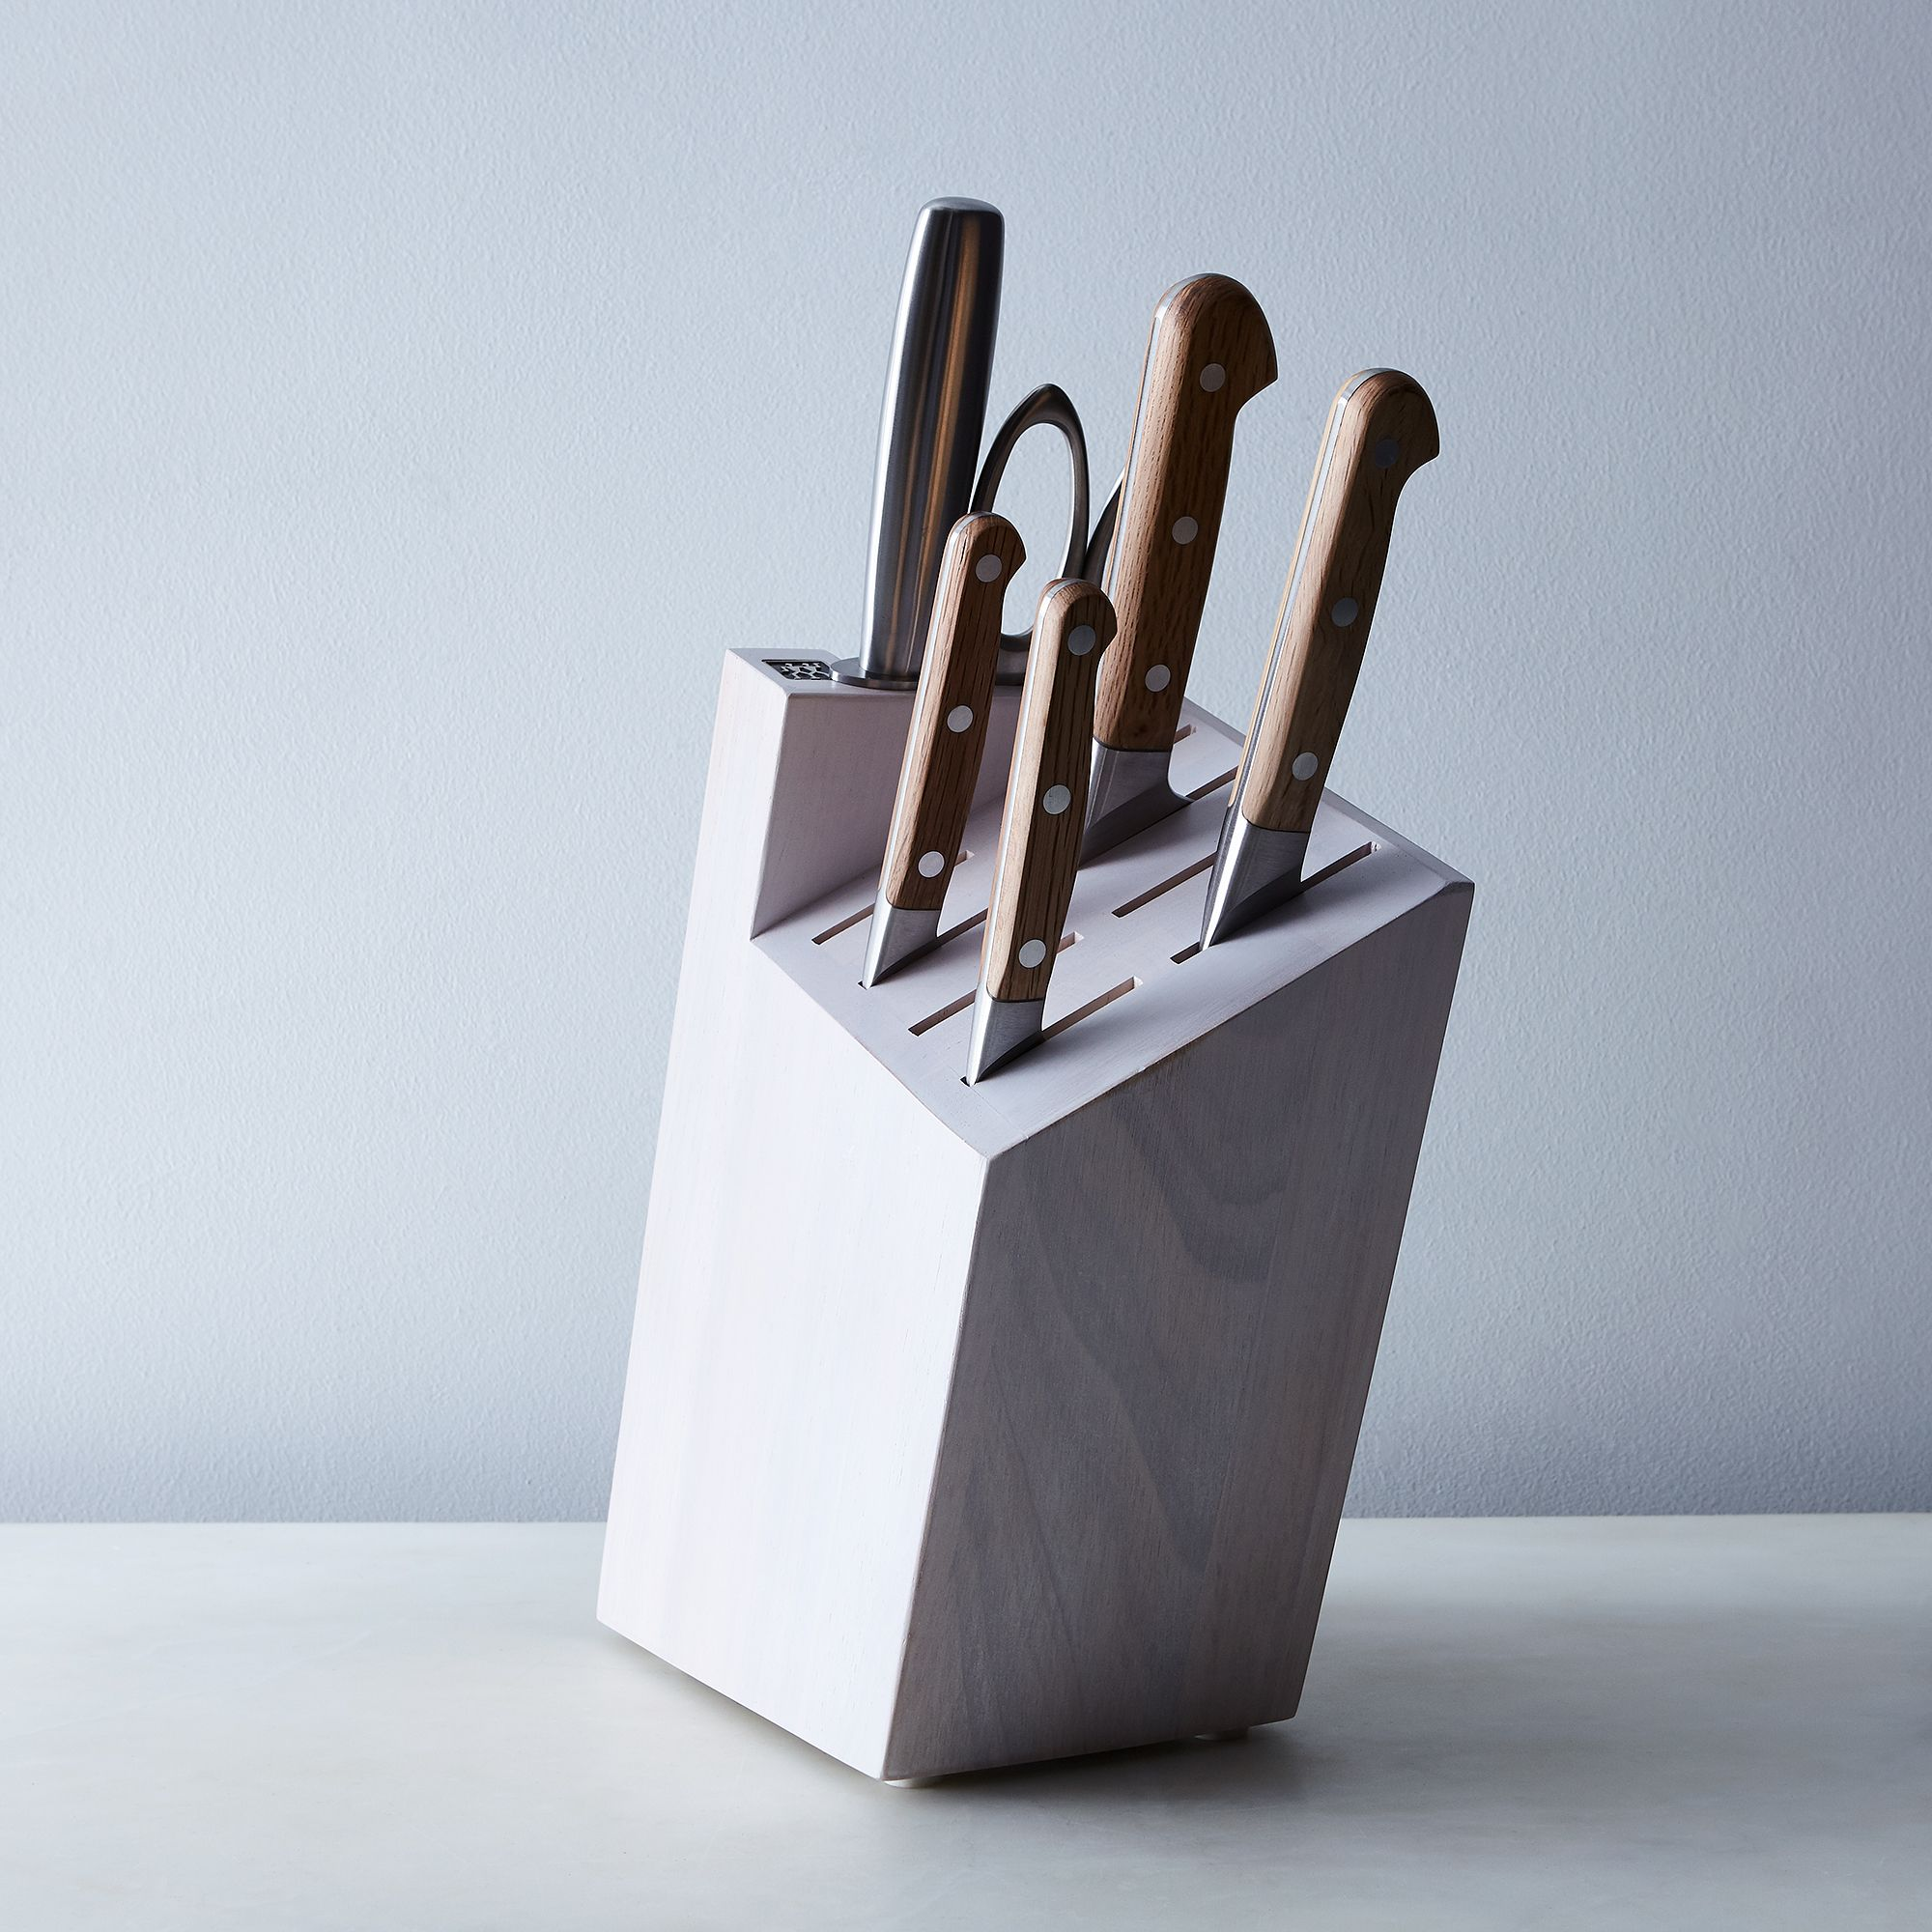 5cc9a004 e584 4a0d 9924 a8e60ebf8683  2017 0411 zwilling holm oak knife 7 piece set silo rocky luten 005